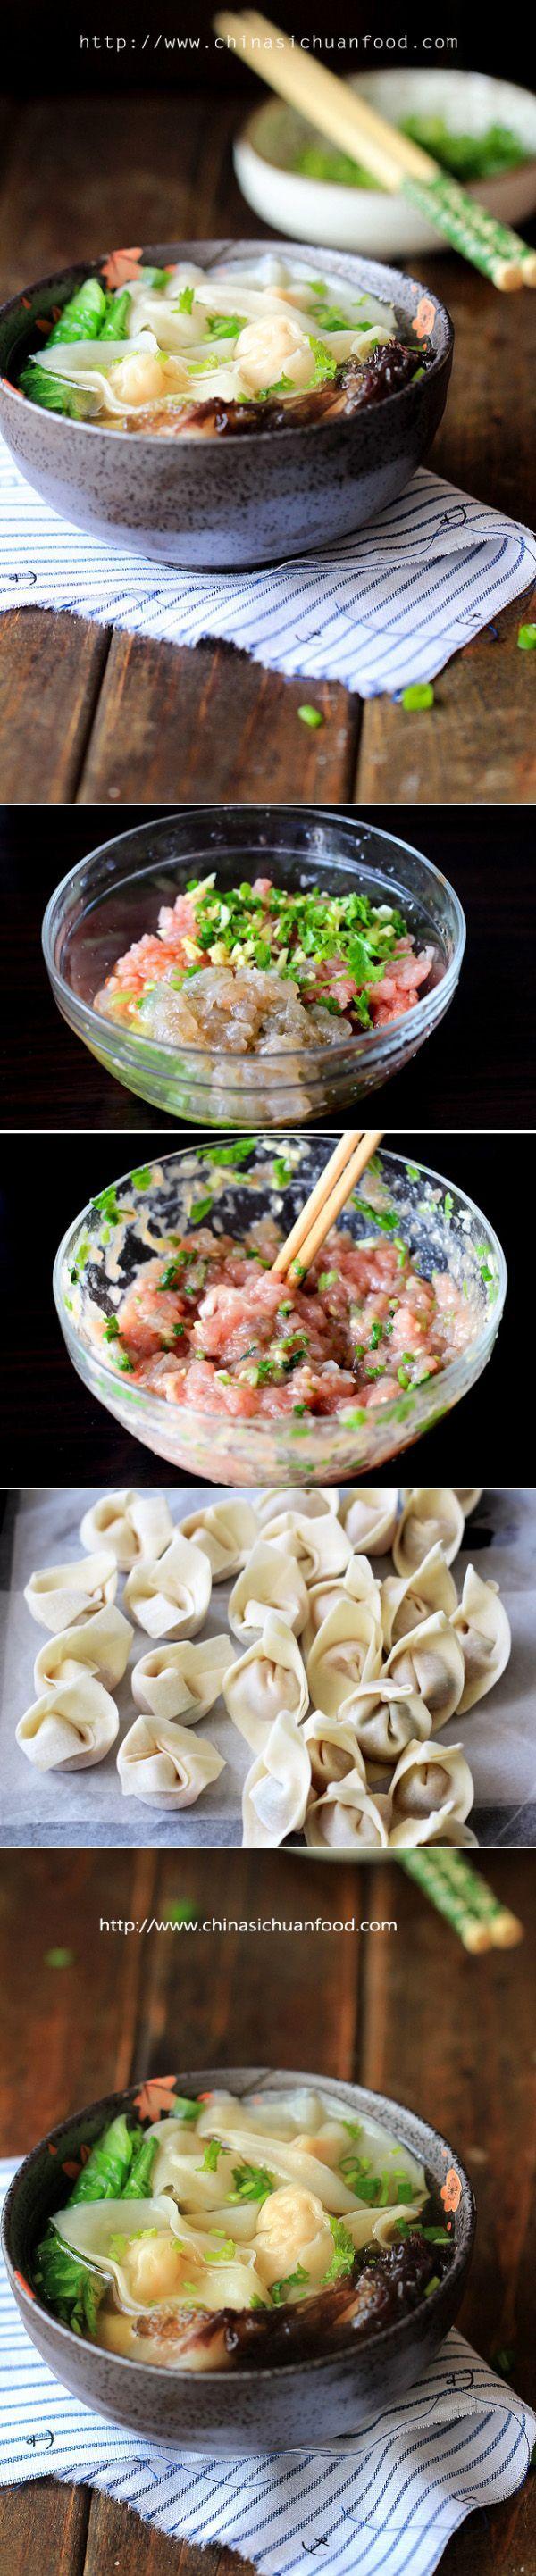 Shrimp Wonton Soup by chinasichuanfood #Soup #Wonton #Shrimp